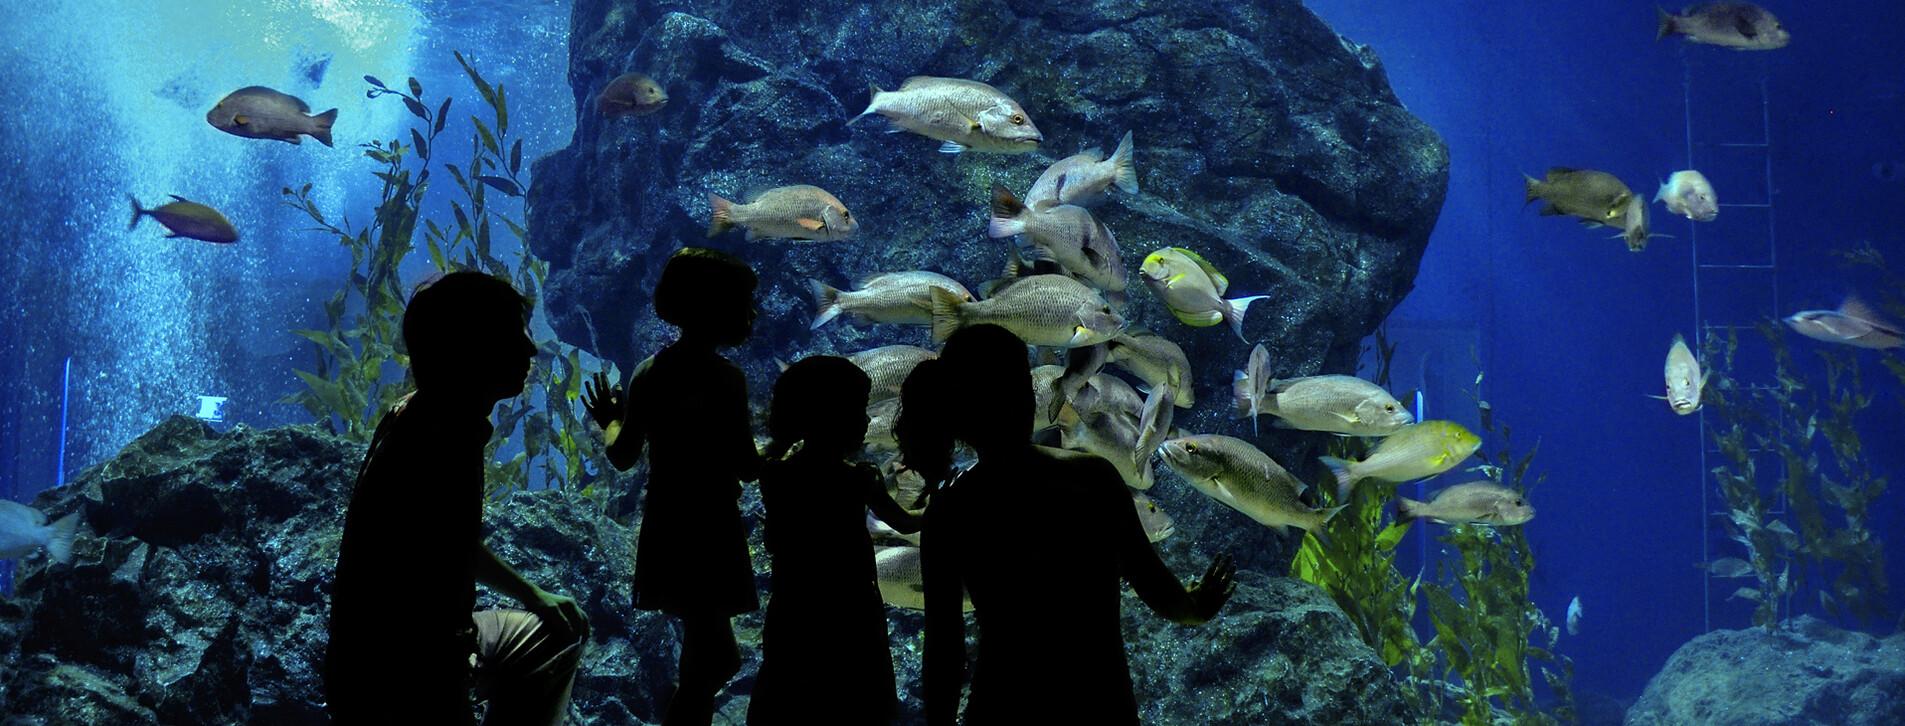 Фото 1 - Океанариум для семьи